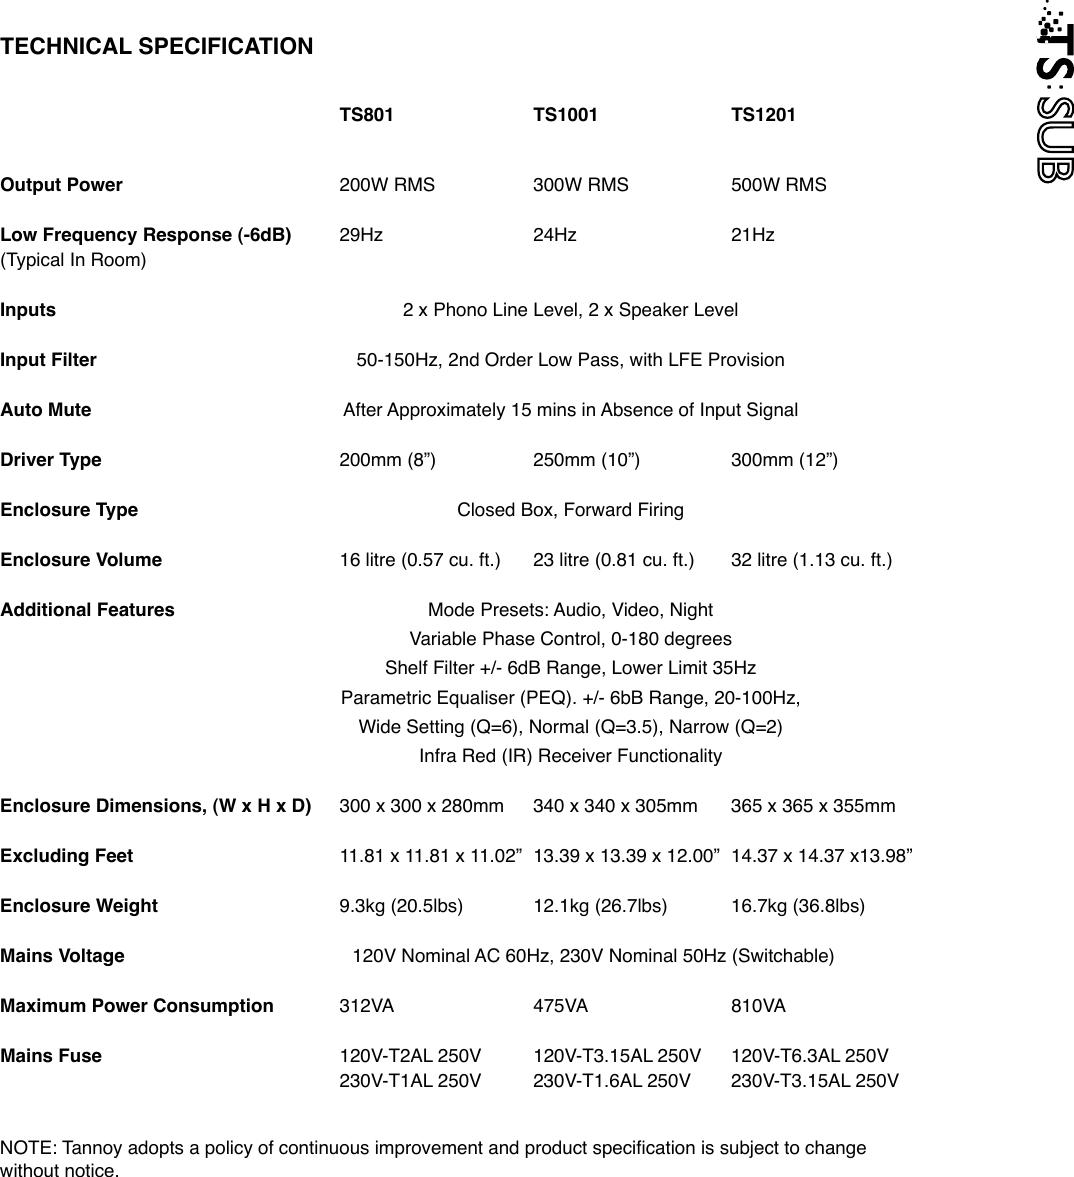 Tannoy TS Sub User Manual To The F8c24cc4 d08d 4320 83c3 9862a3175a29